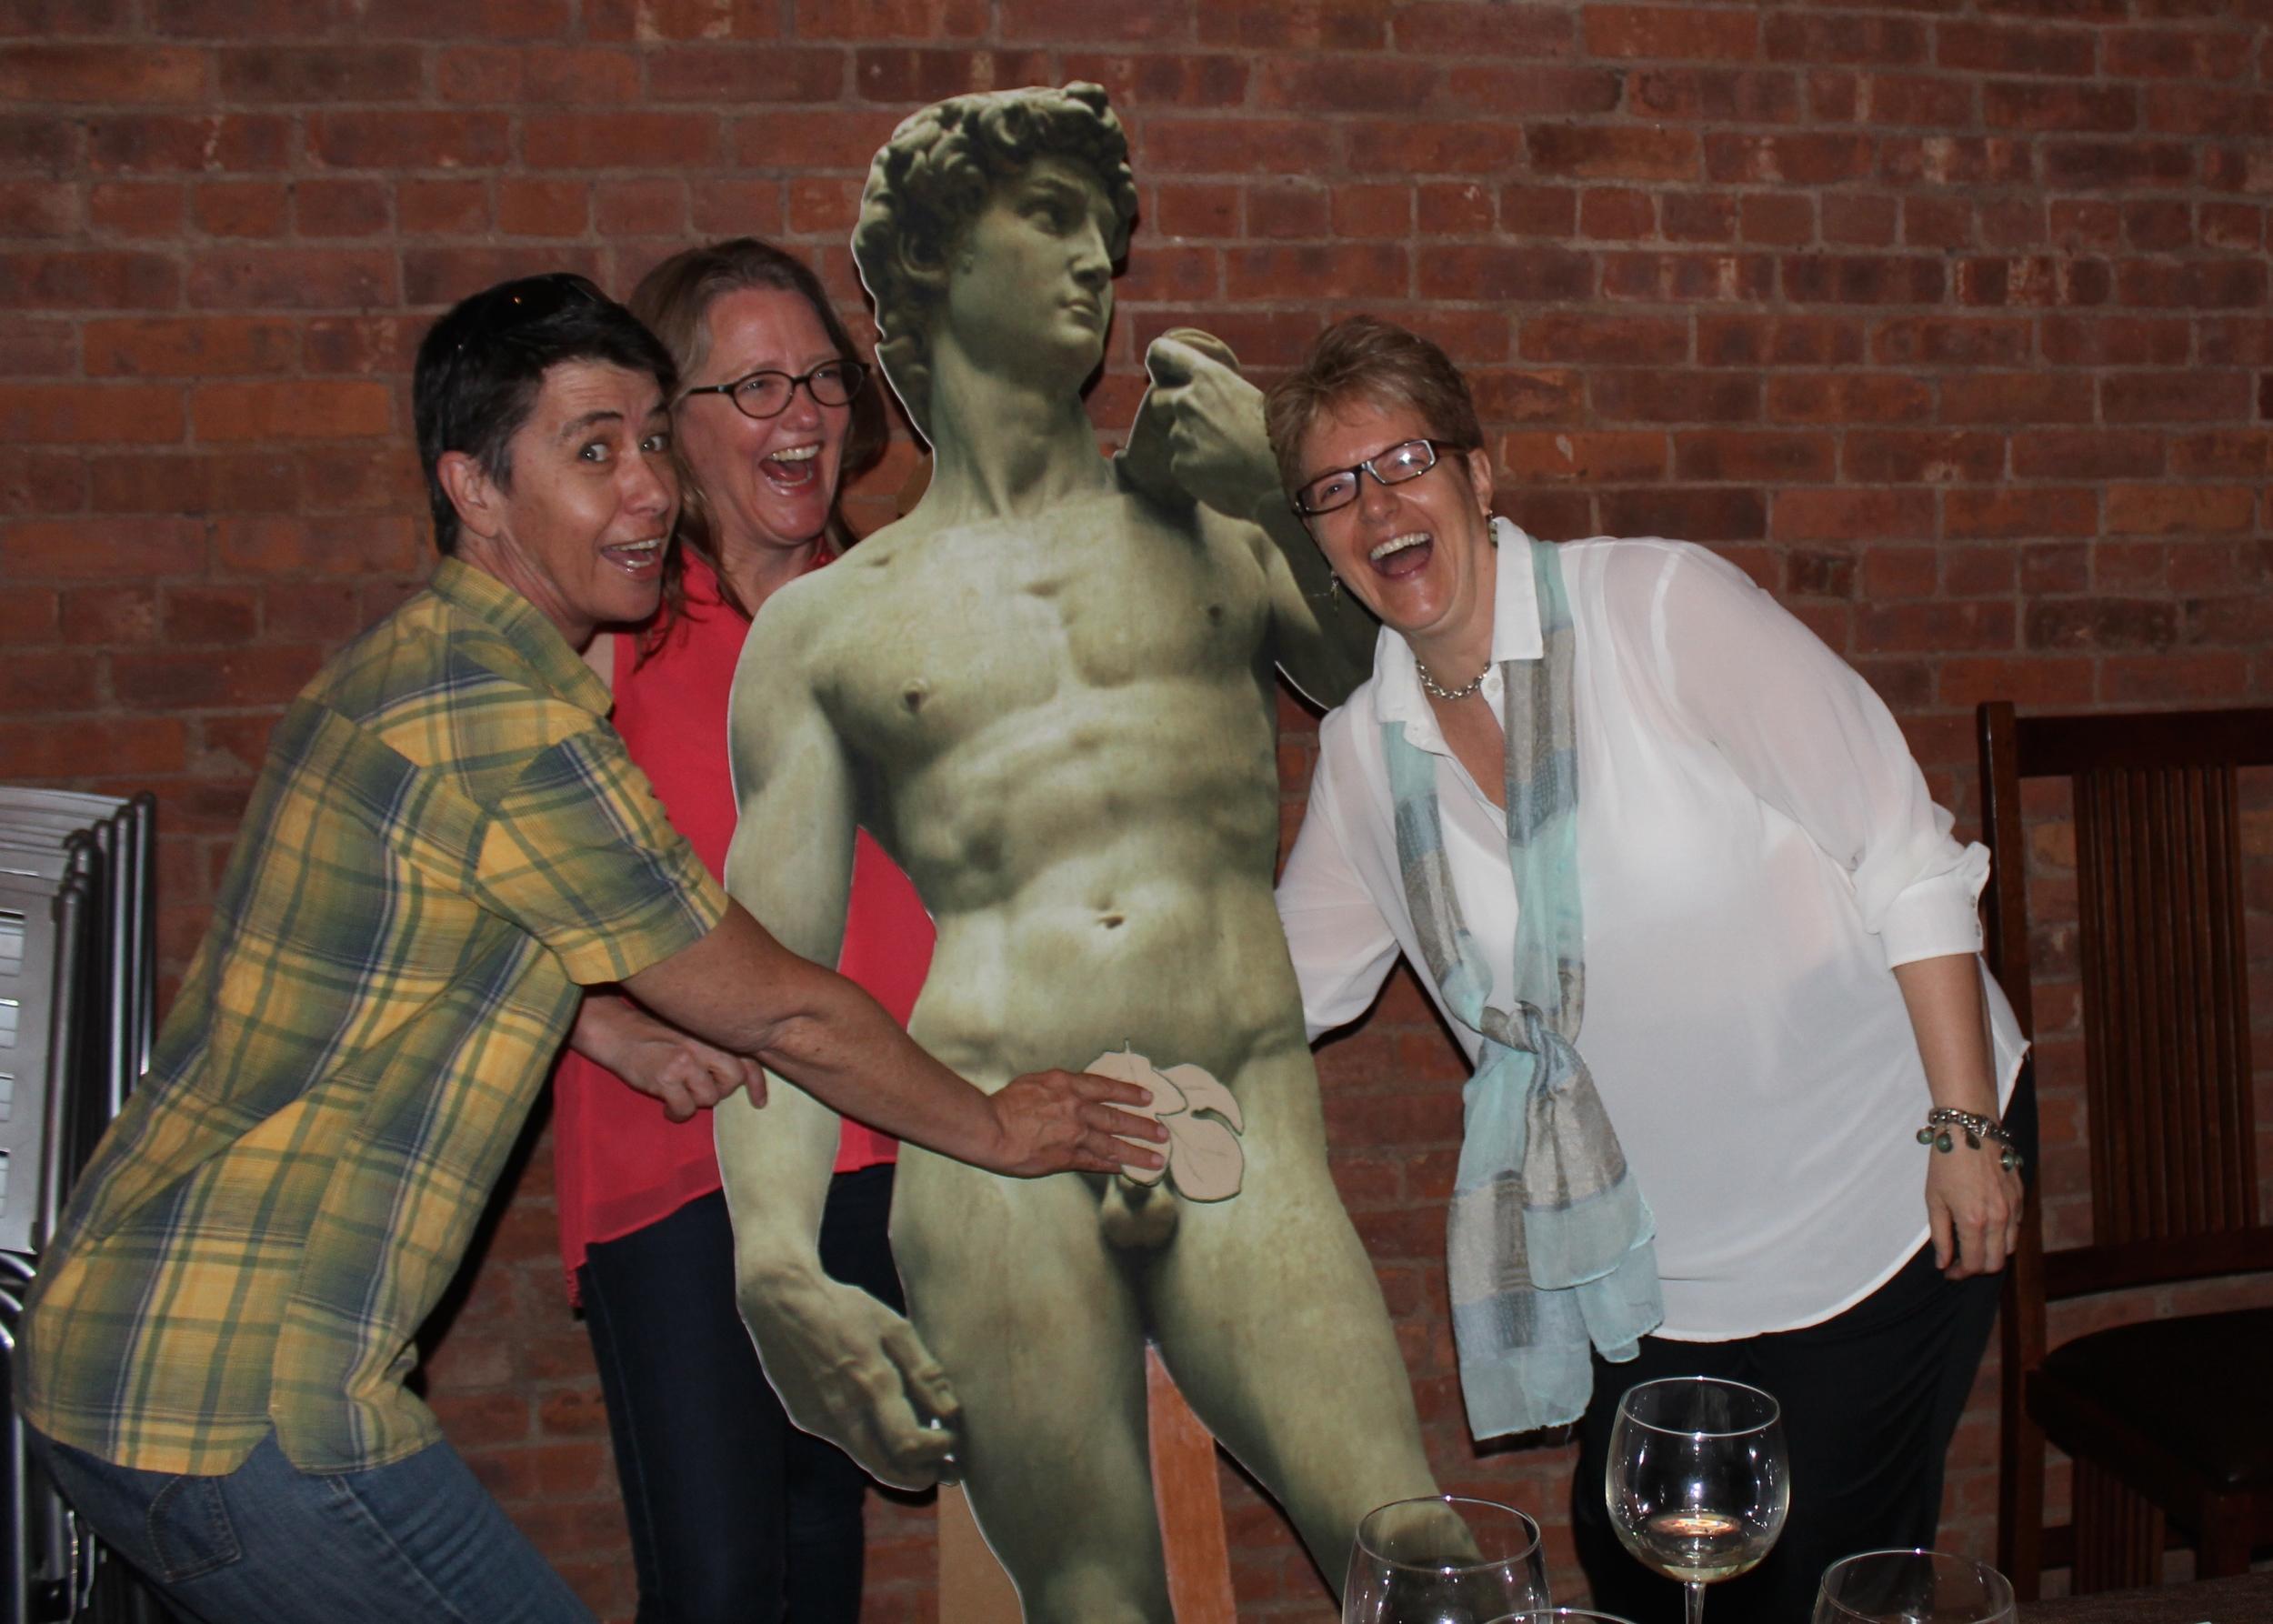 Joanna Marple, Sarah Towle, David, and Emma D. Dryden at KidLit TV's TTT&T Kickstarter Launch Party.